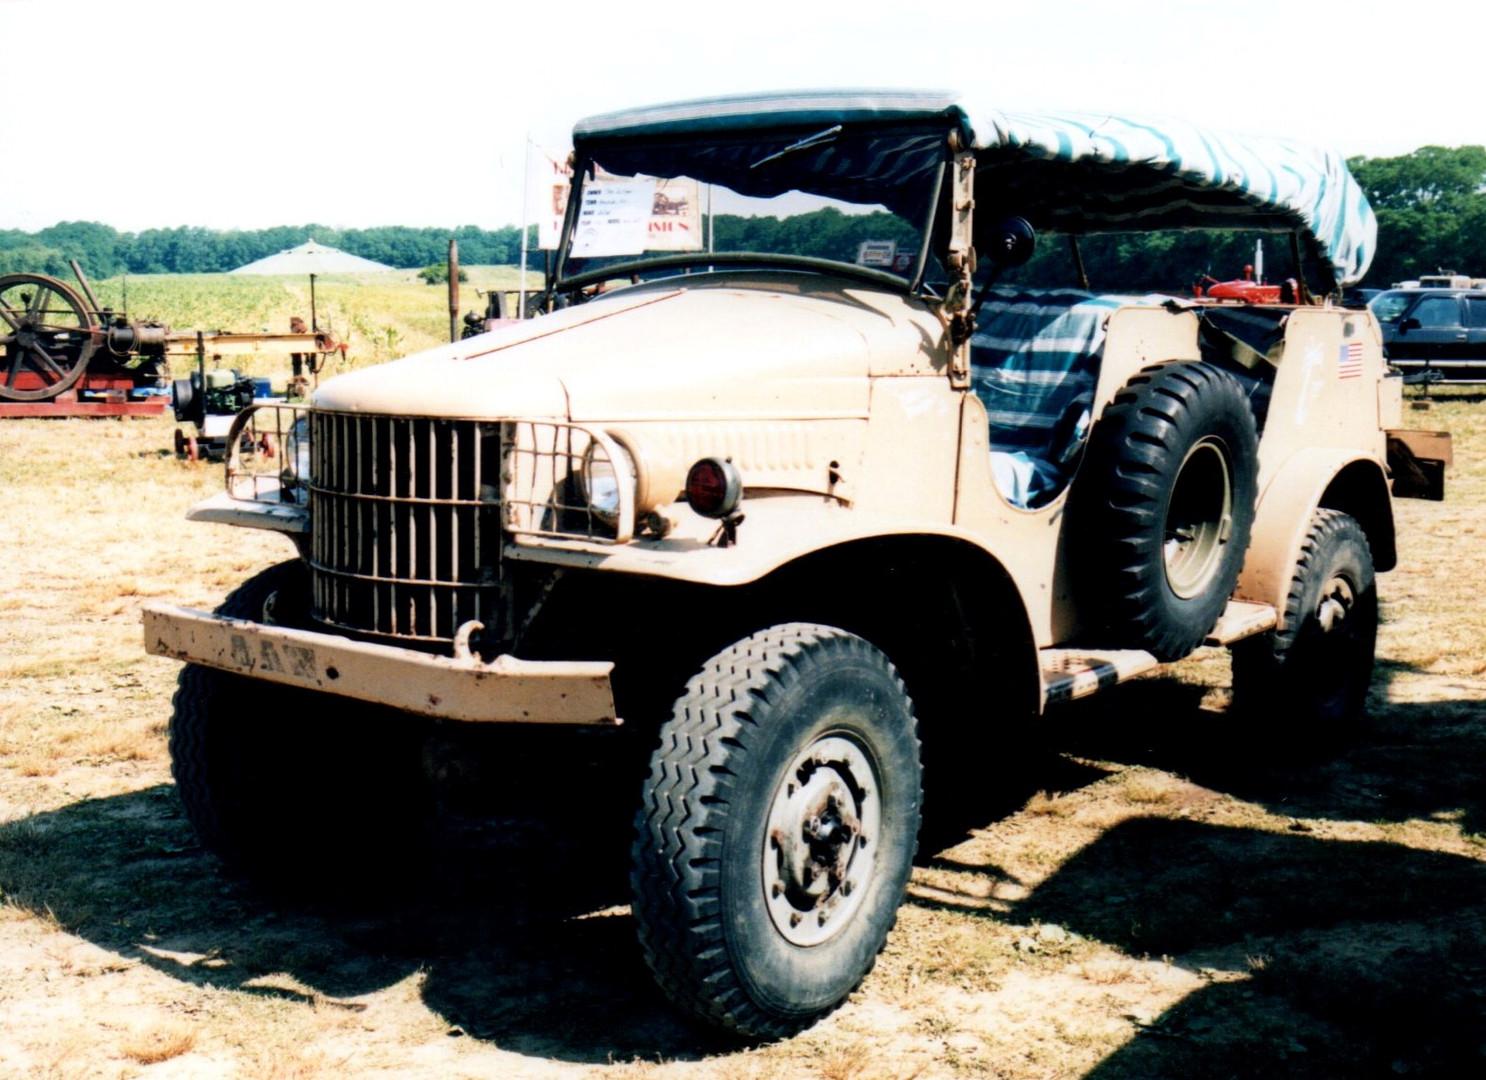 1942 Dodge WC25 command car